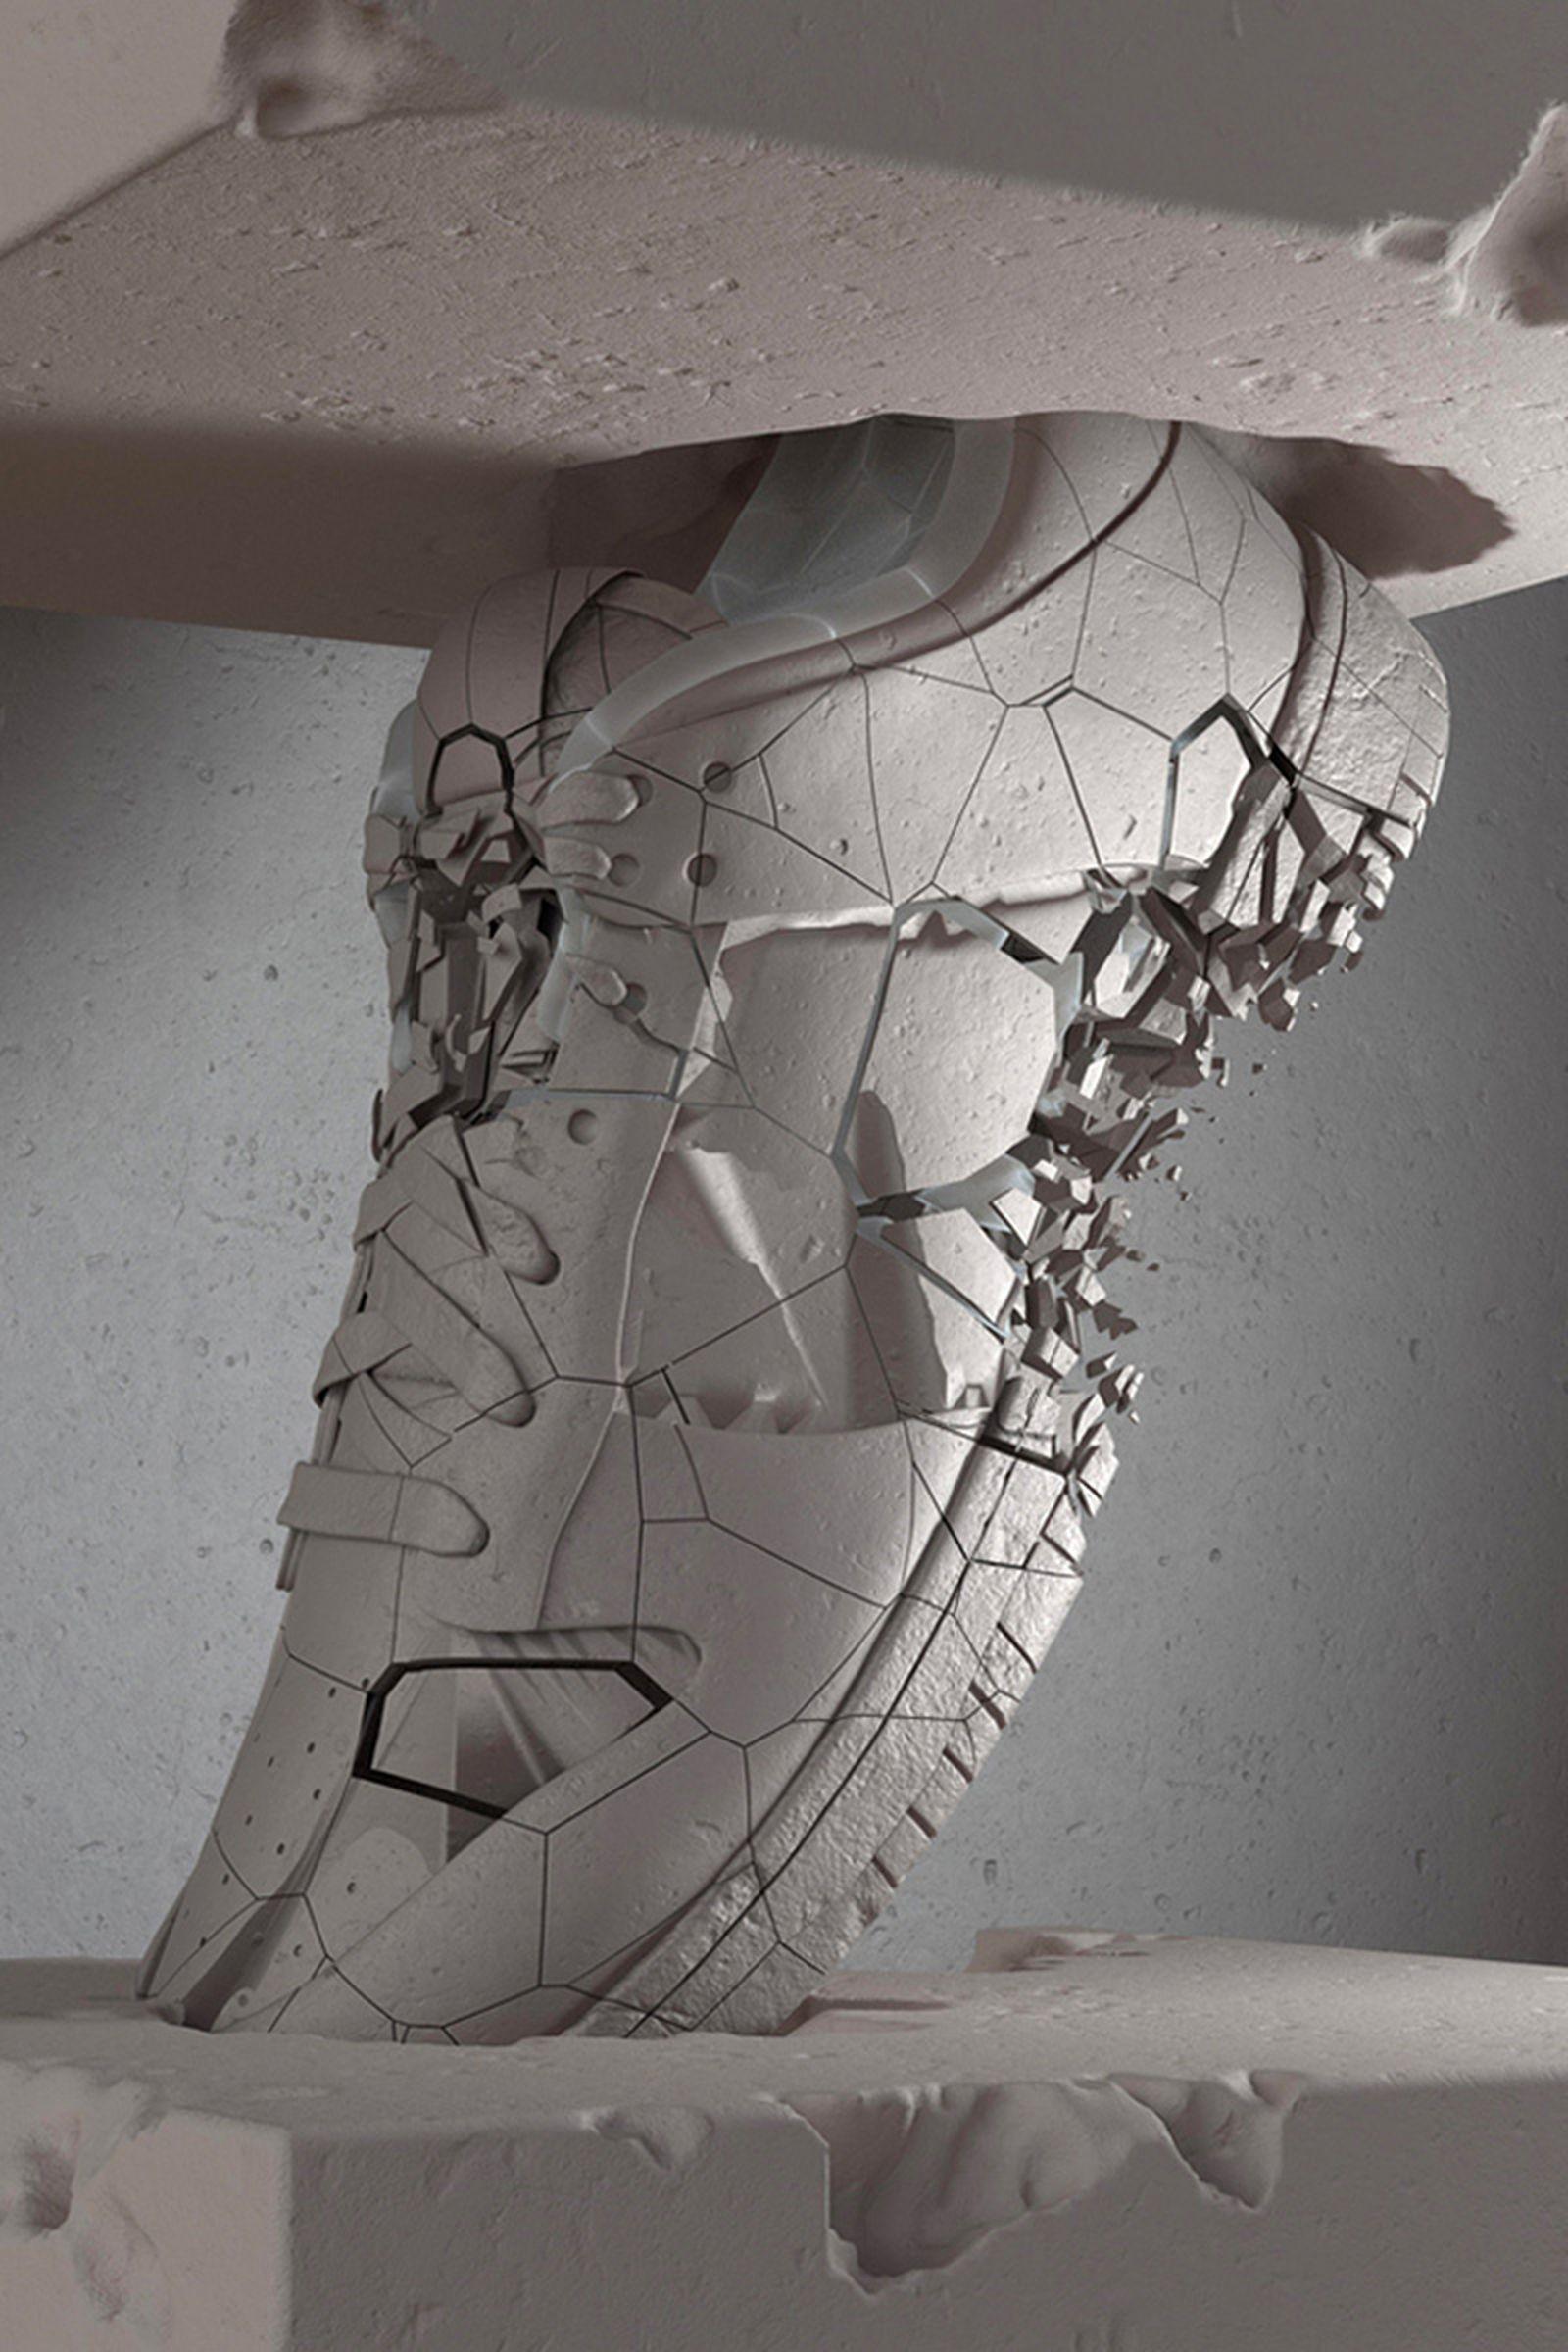 rare-sneaker-nft-sneaker-art-04